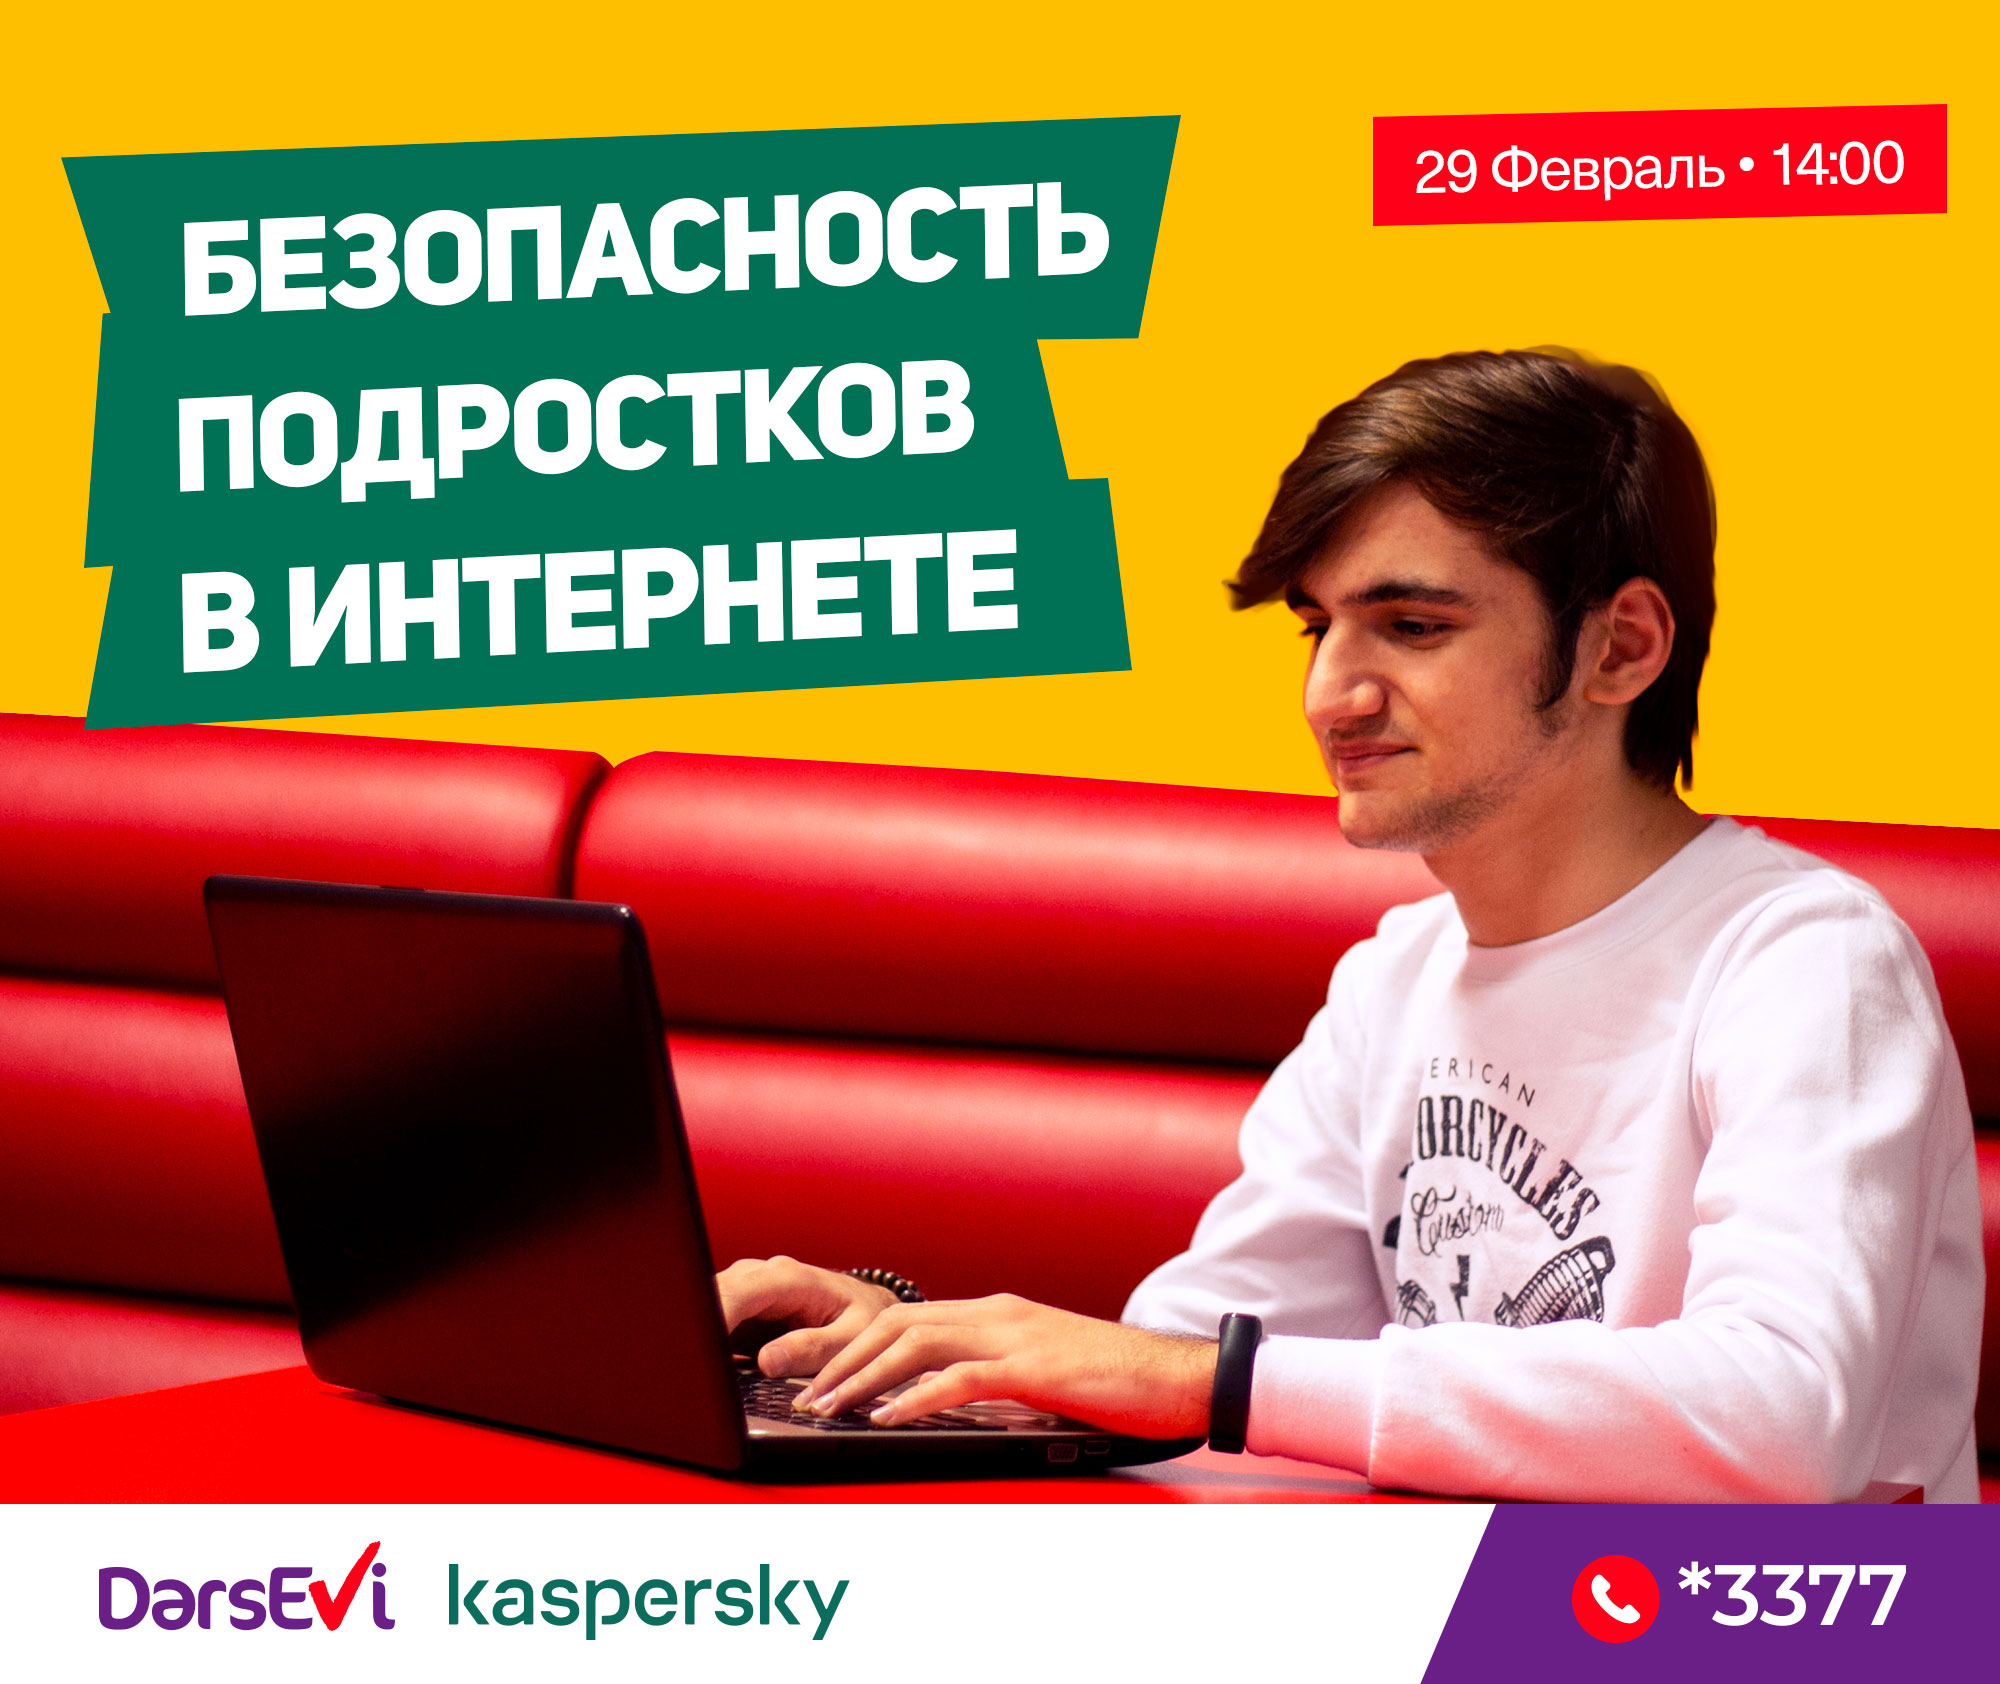 kaspersky_poster_rus_1